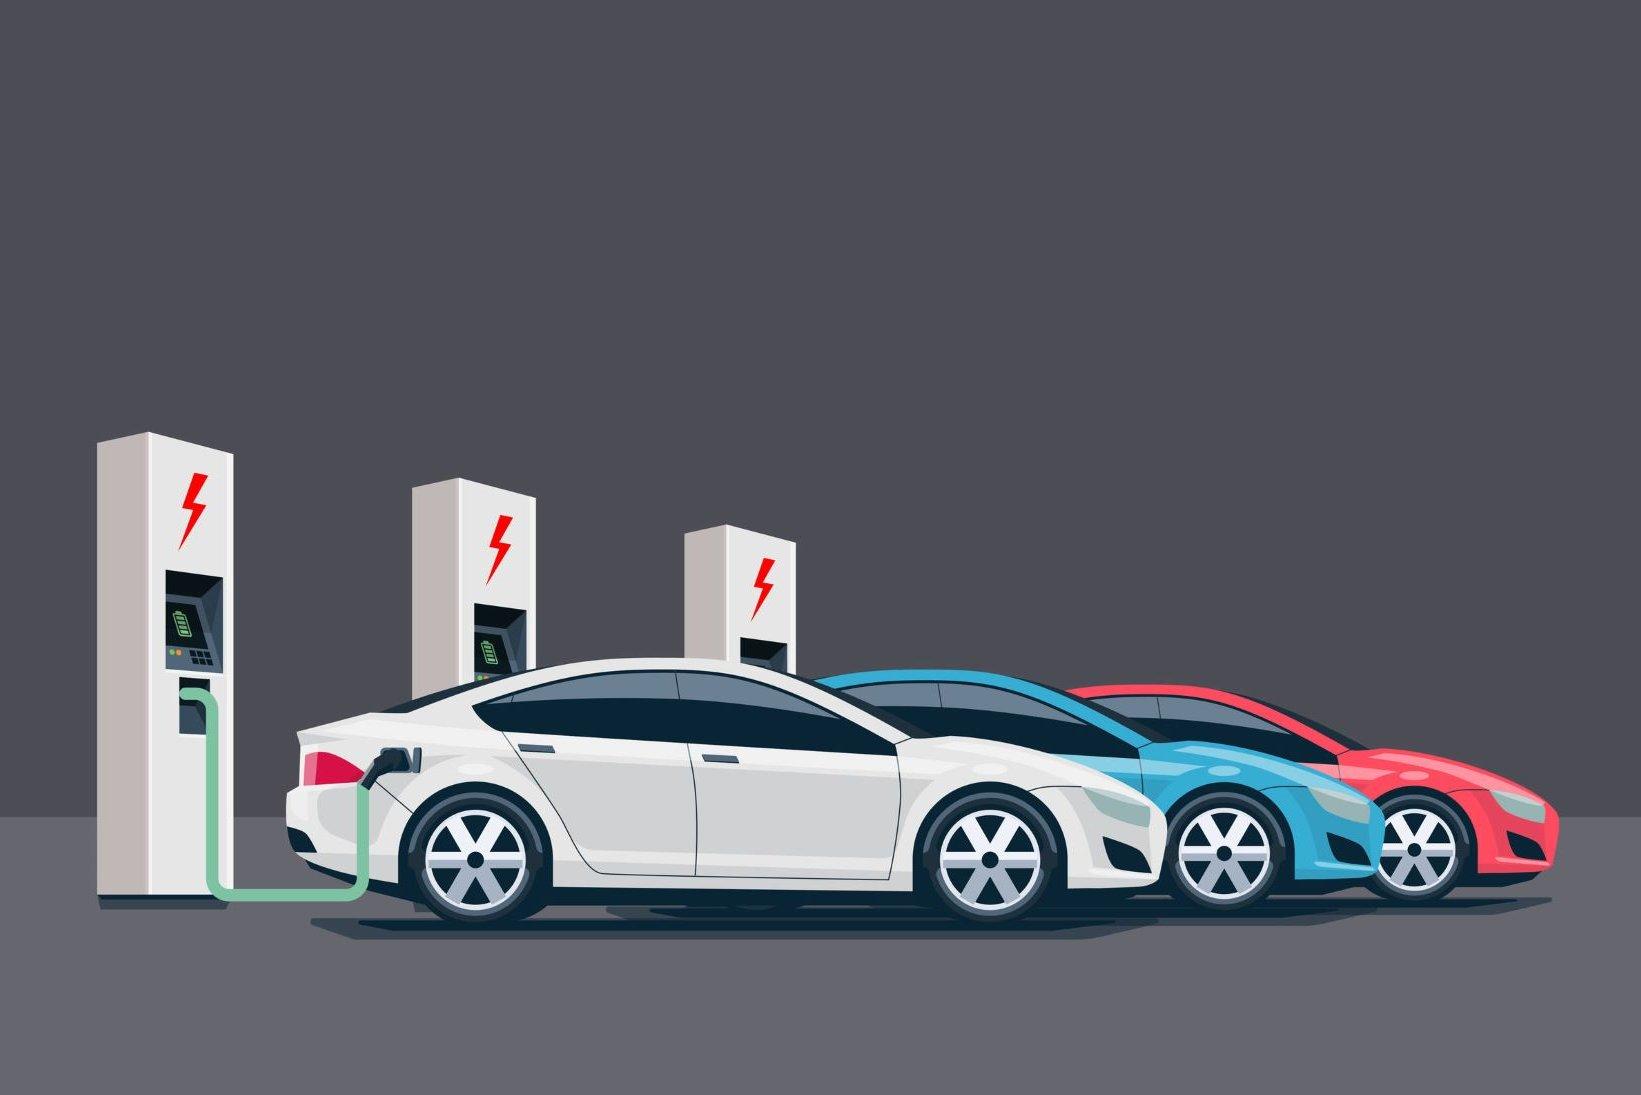 perpres mobil listrik, mobil listrik, listrik PLN, insentif pajak untuk mobil listrik